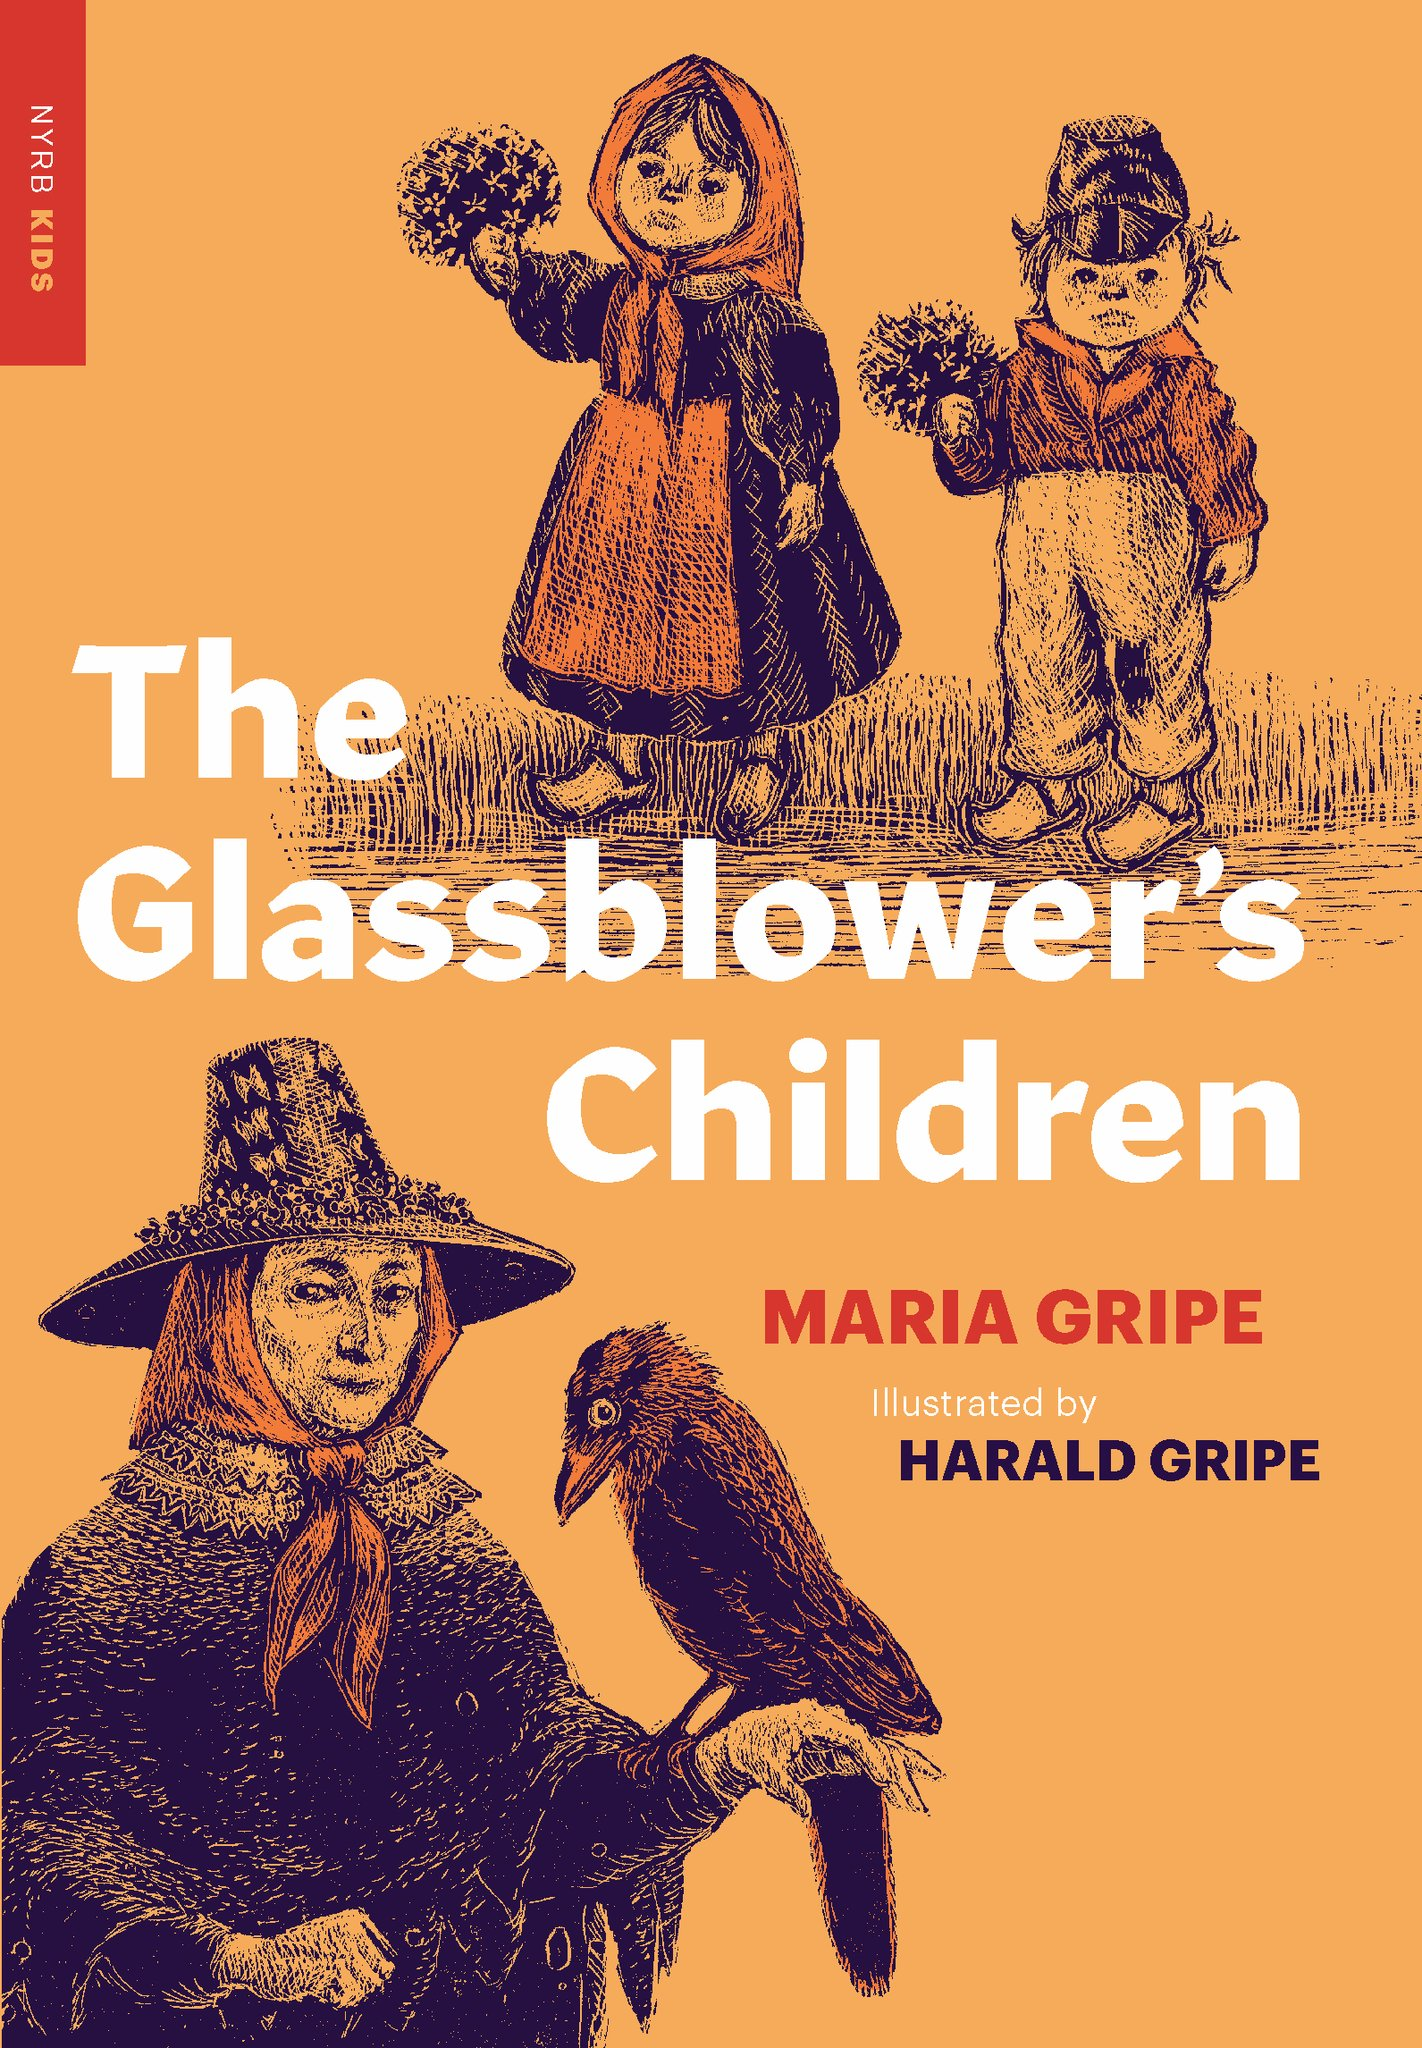 The Glassblower's Children (cover)